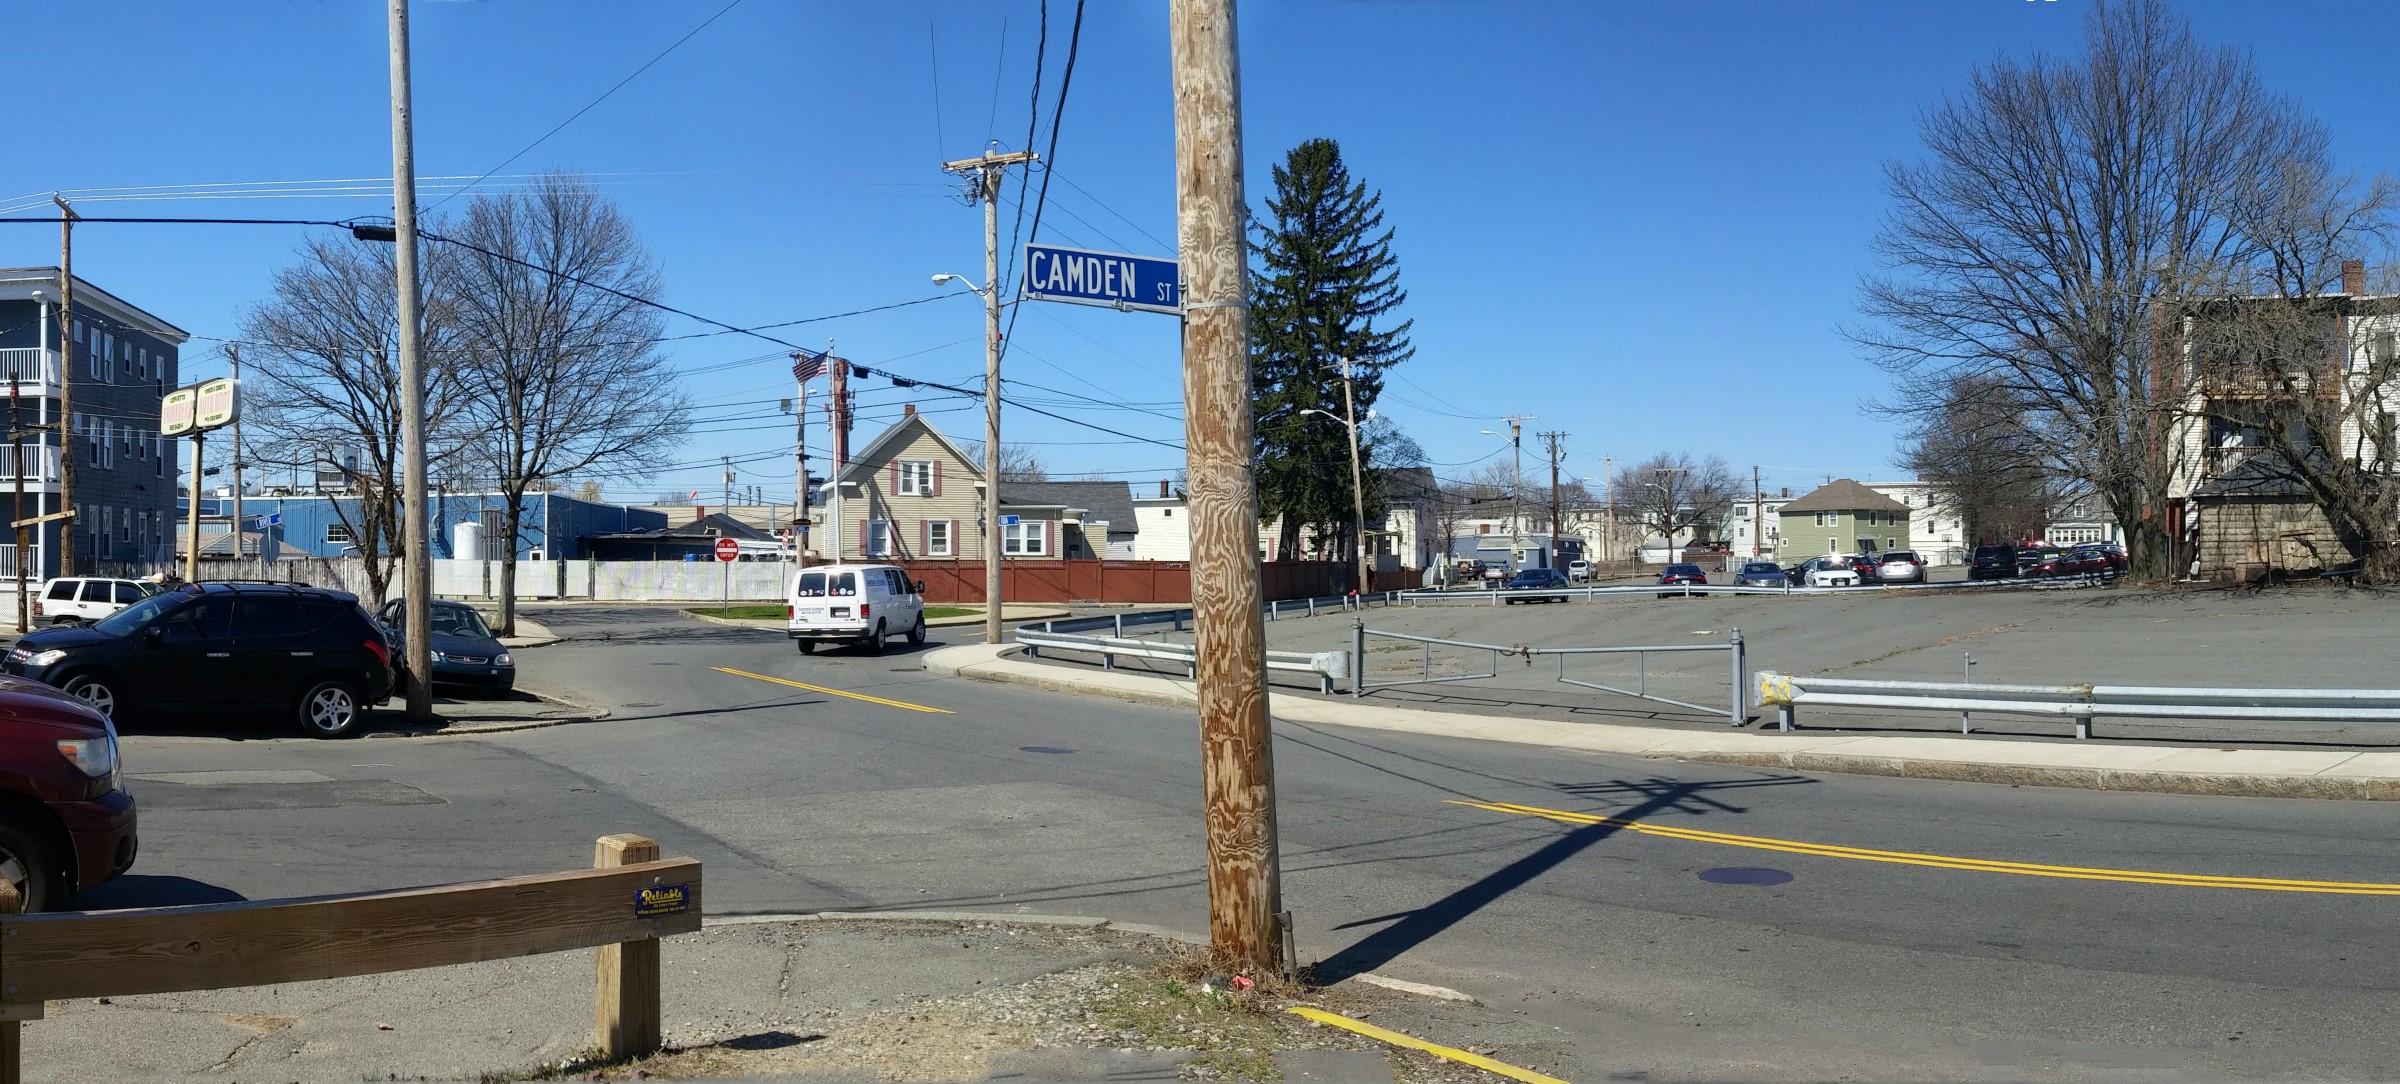 Lynn Coastal Zone Management camden street before